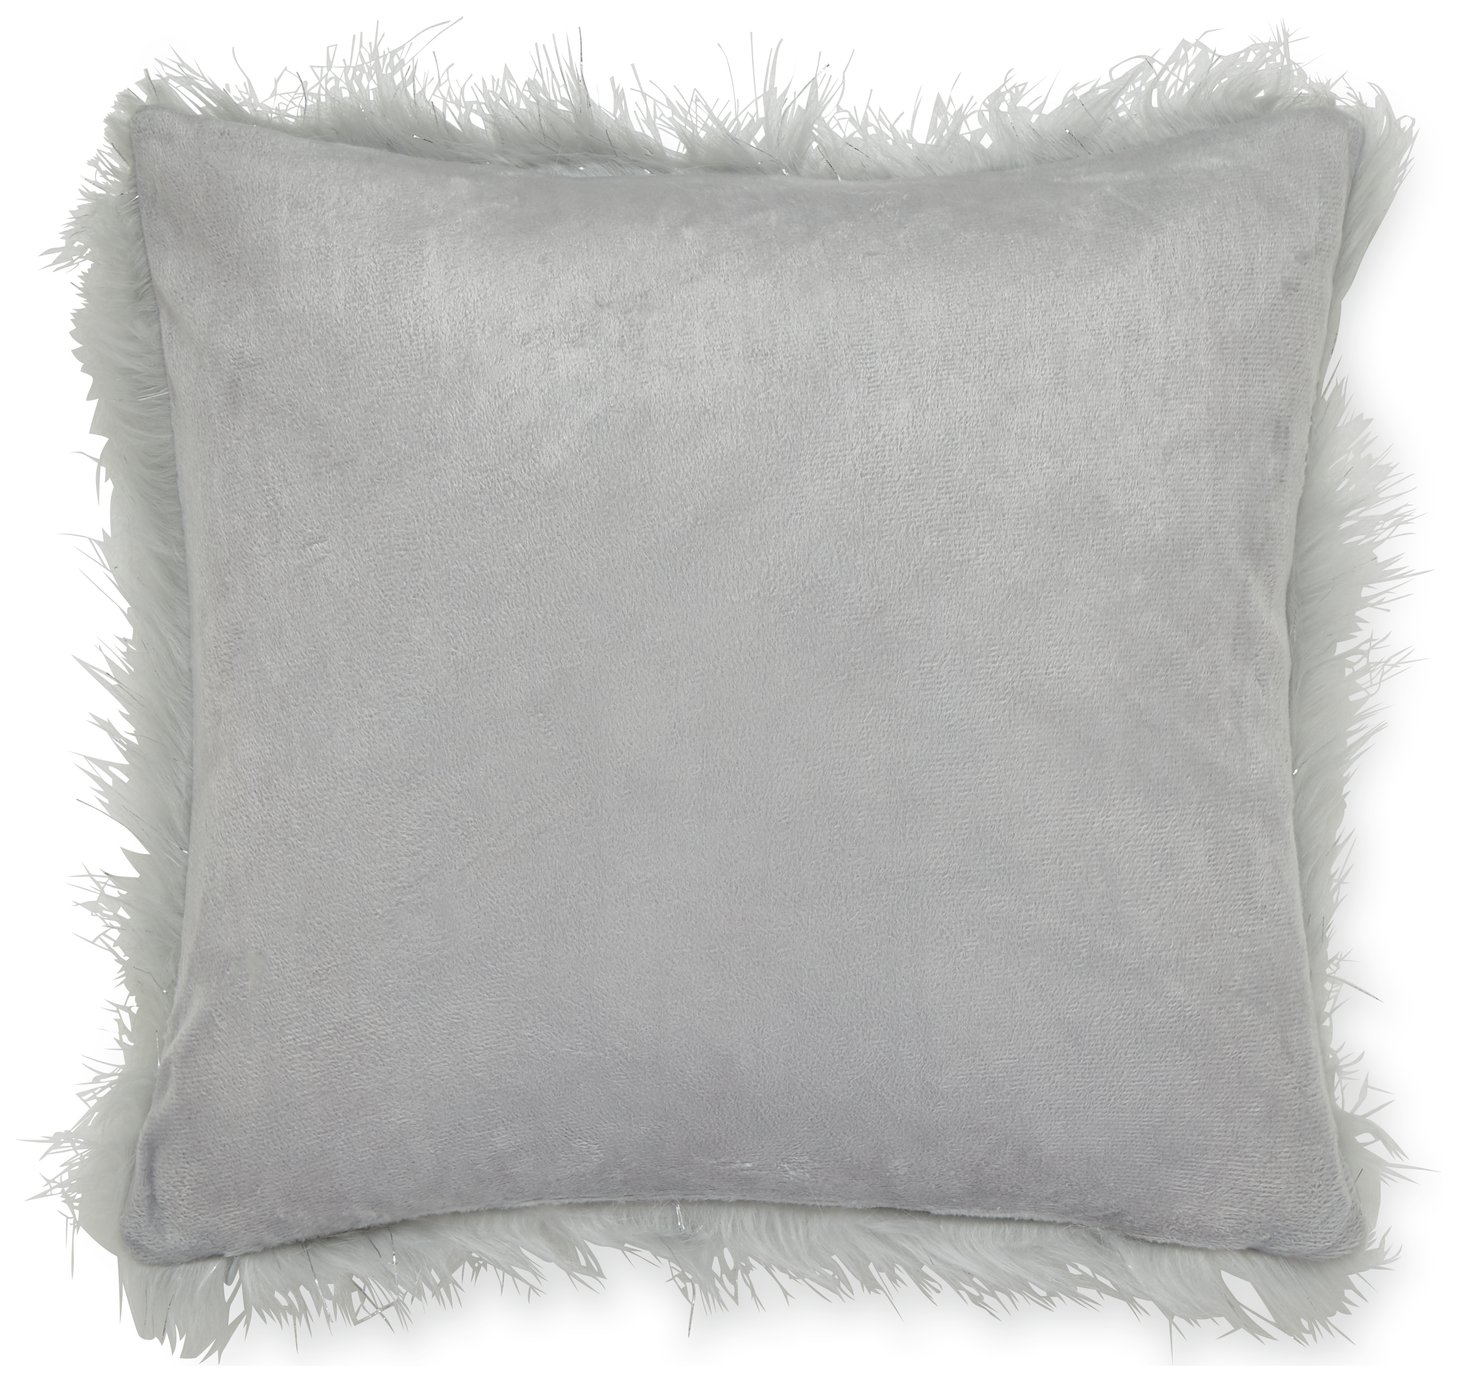 Catherine Lansfield Set of 2 Metallic Cushions - Silver